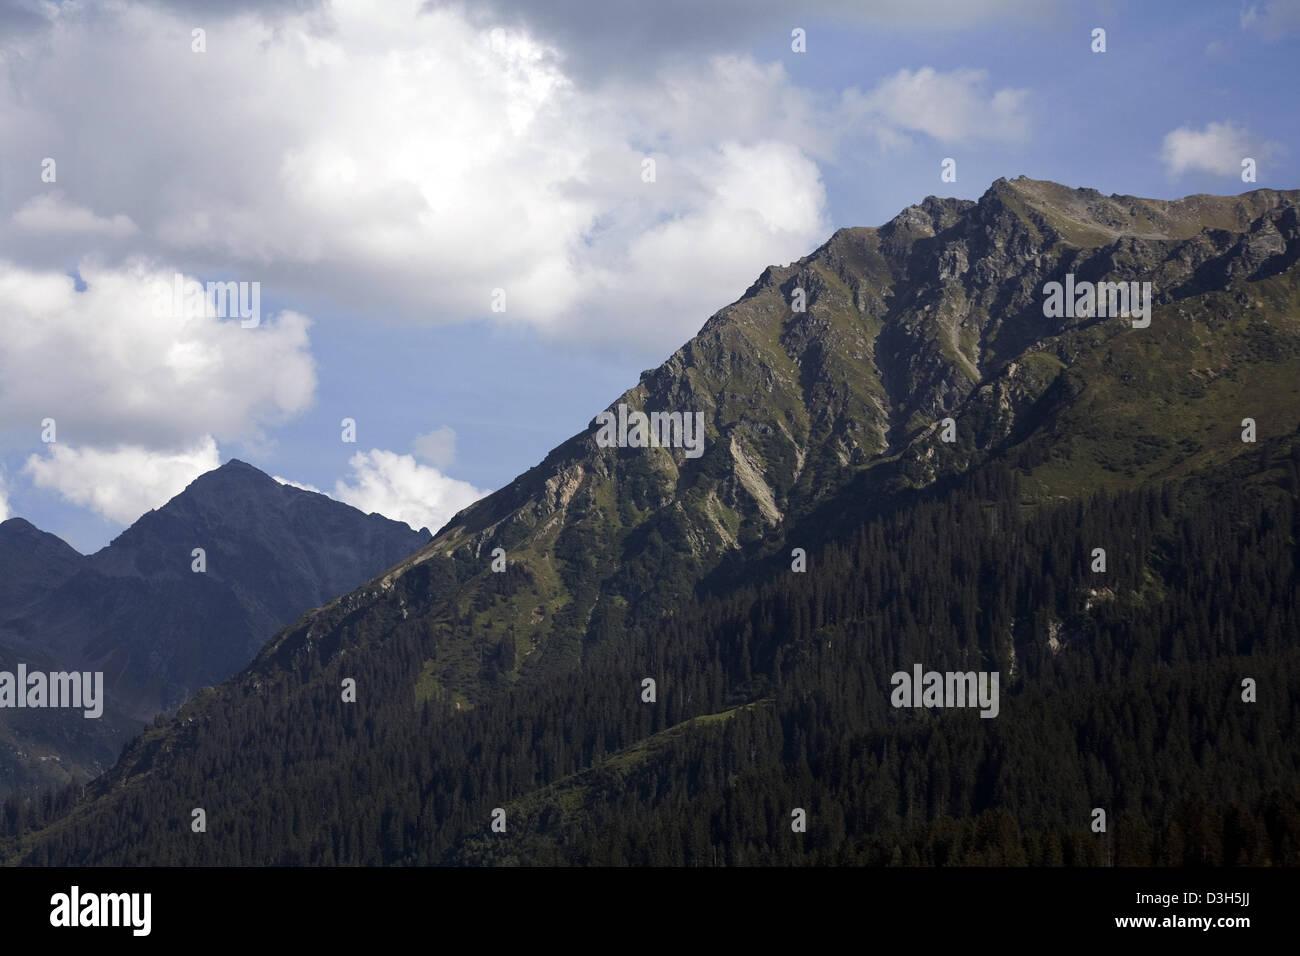 Wooded mountainsides along The Landquart Valley Klosters Graubunden Switzerland - Stock Image